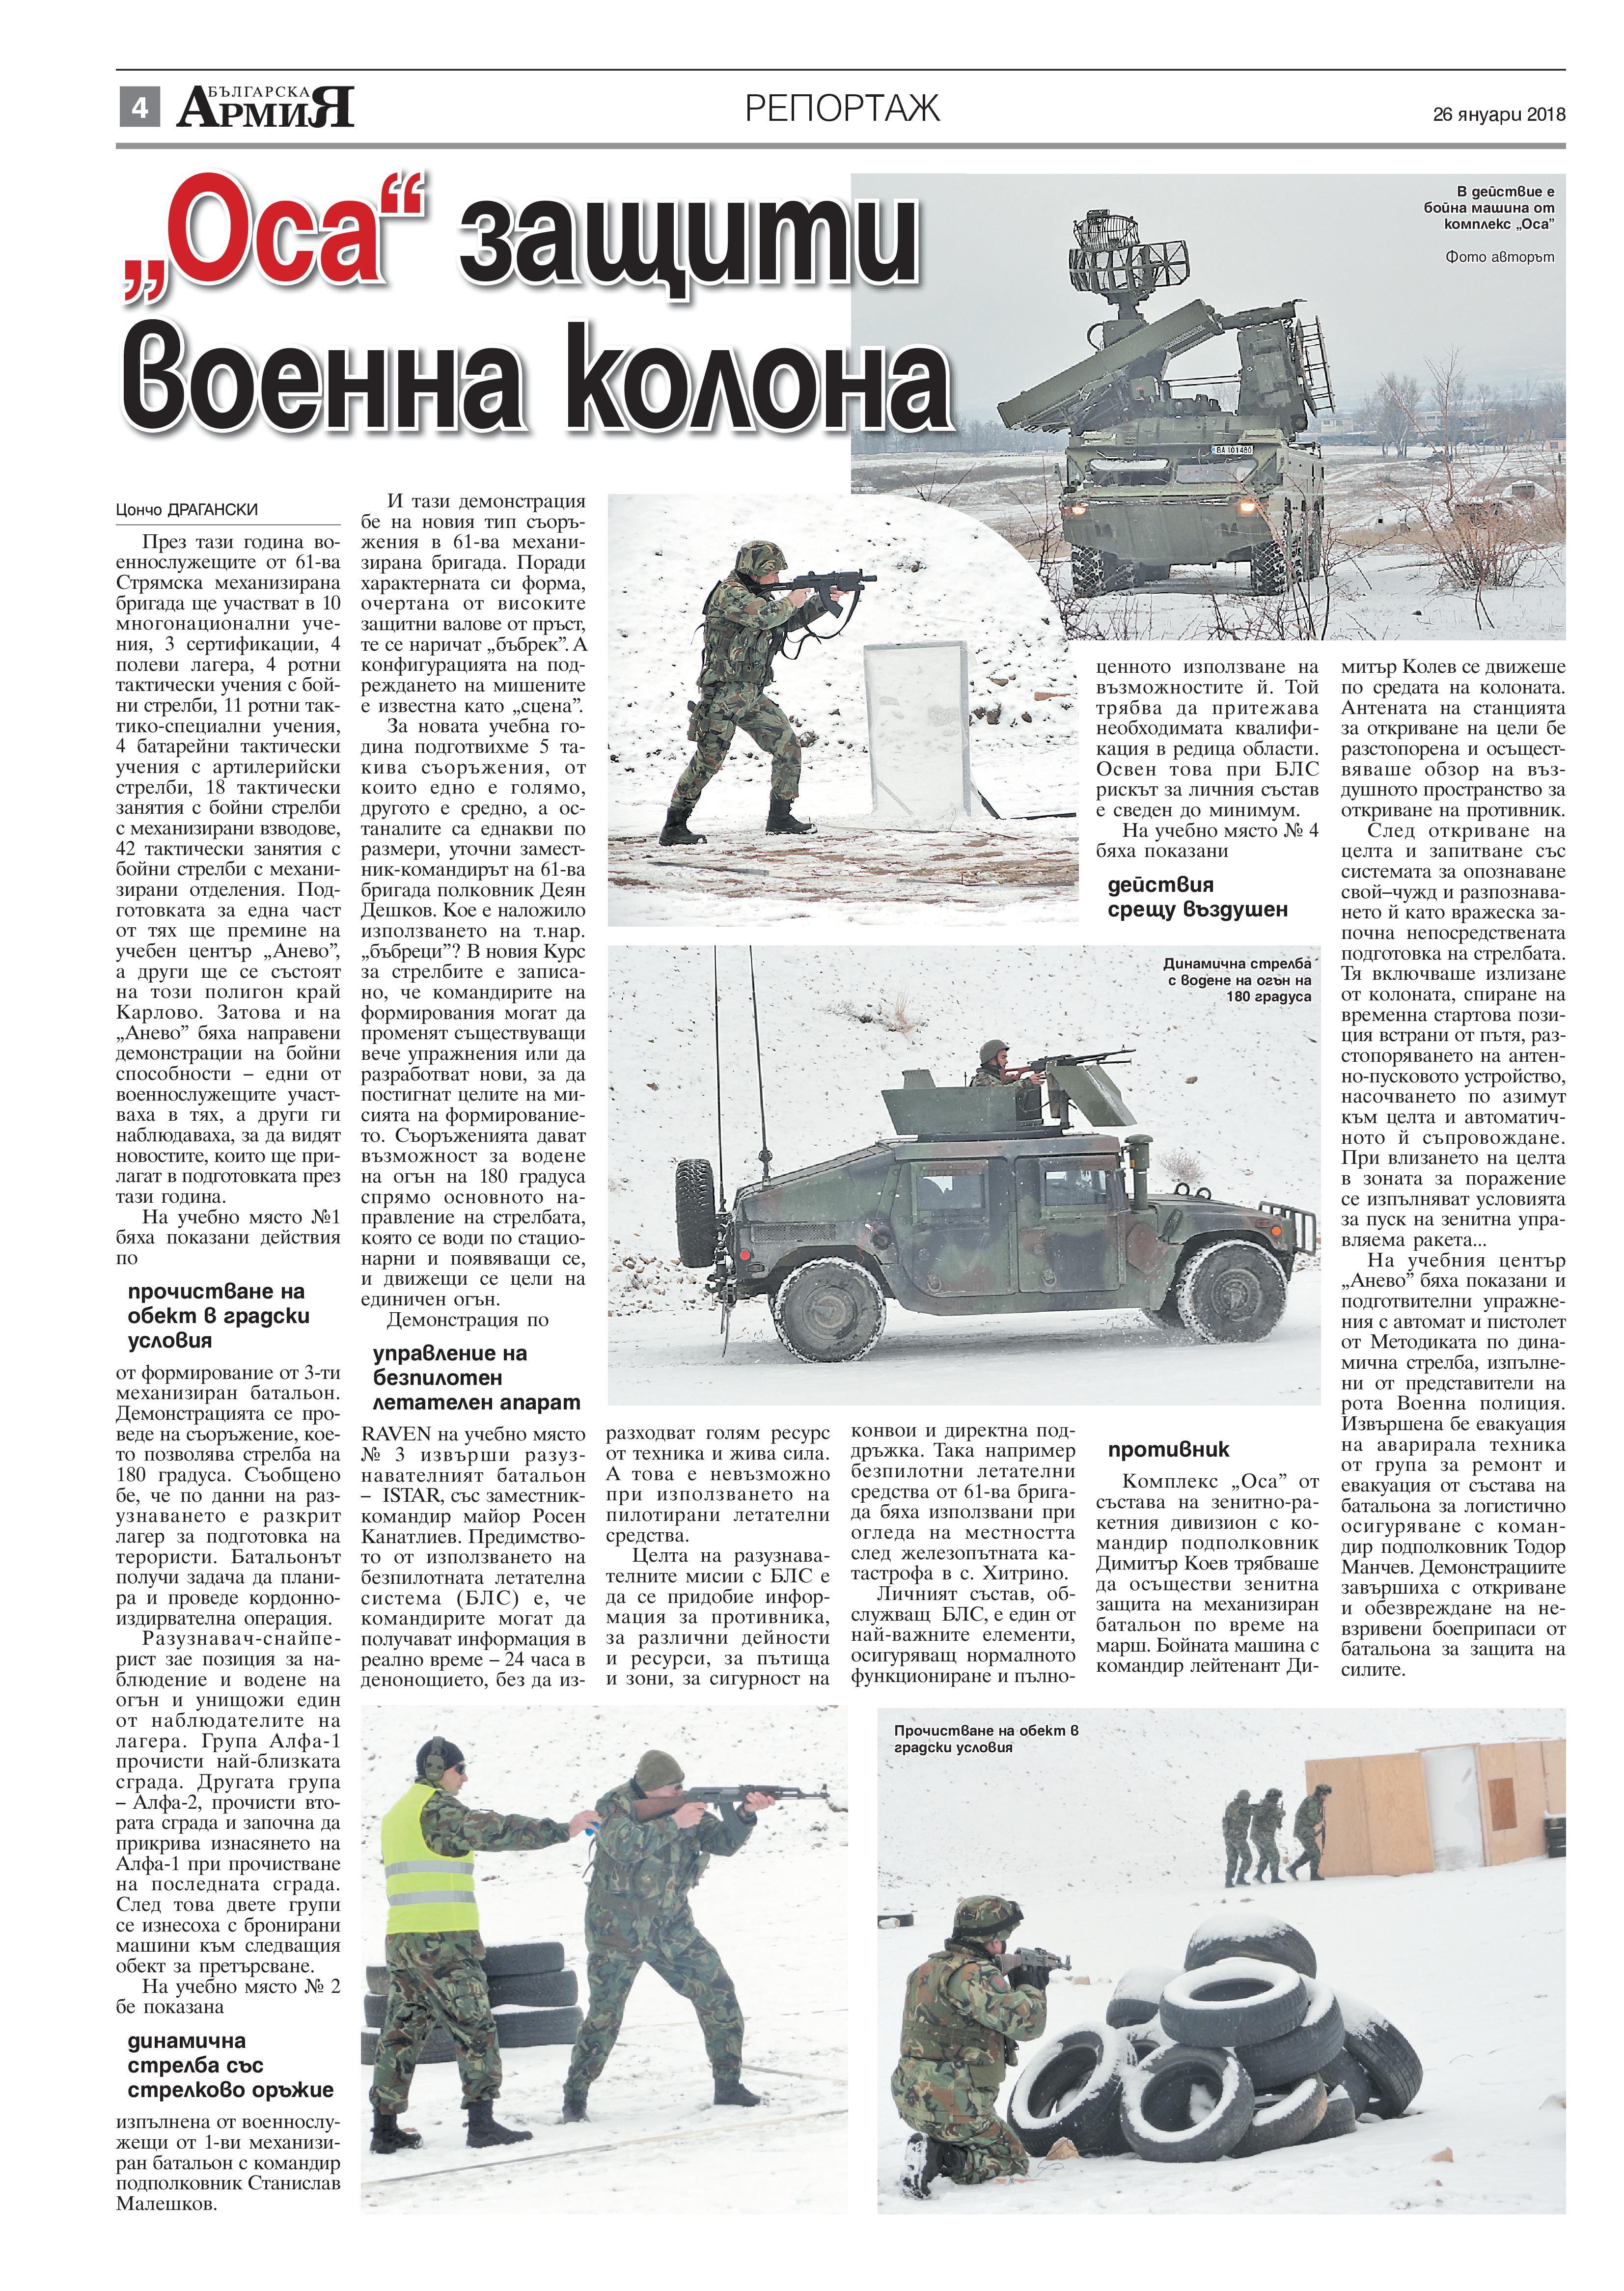 http://armymedia.bg/wp-content/uploads/2015/06/04-17.jpg